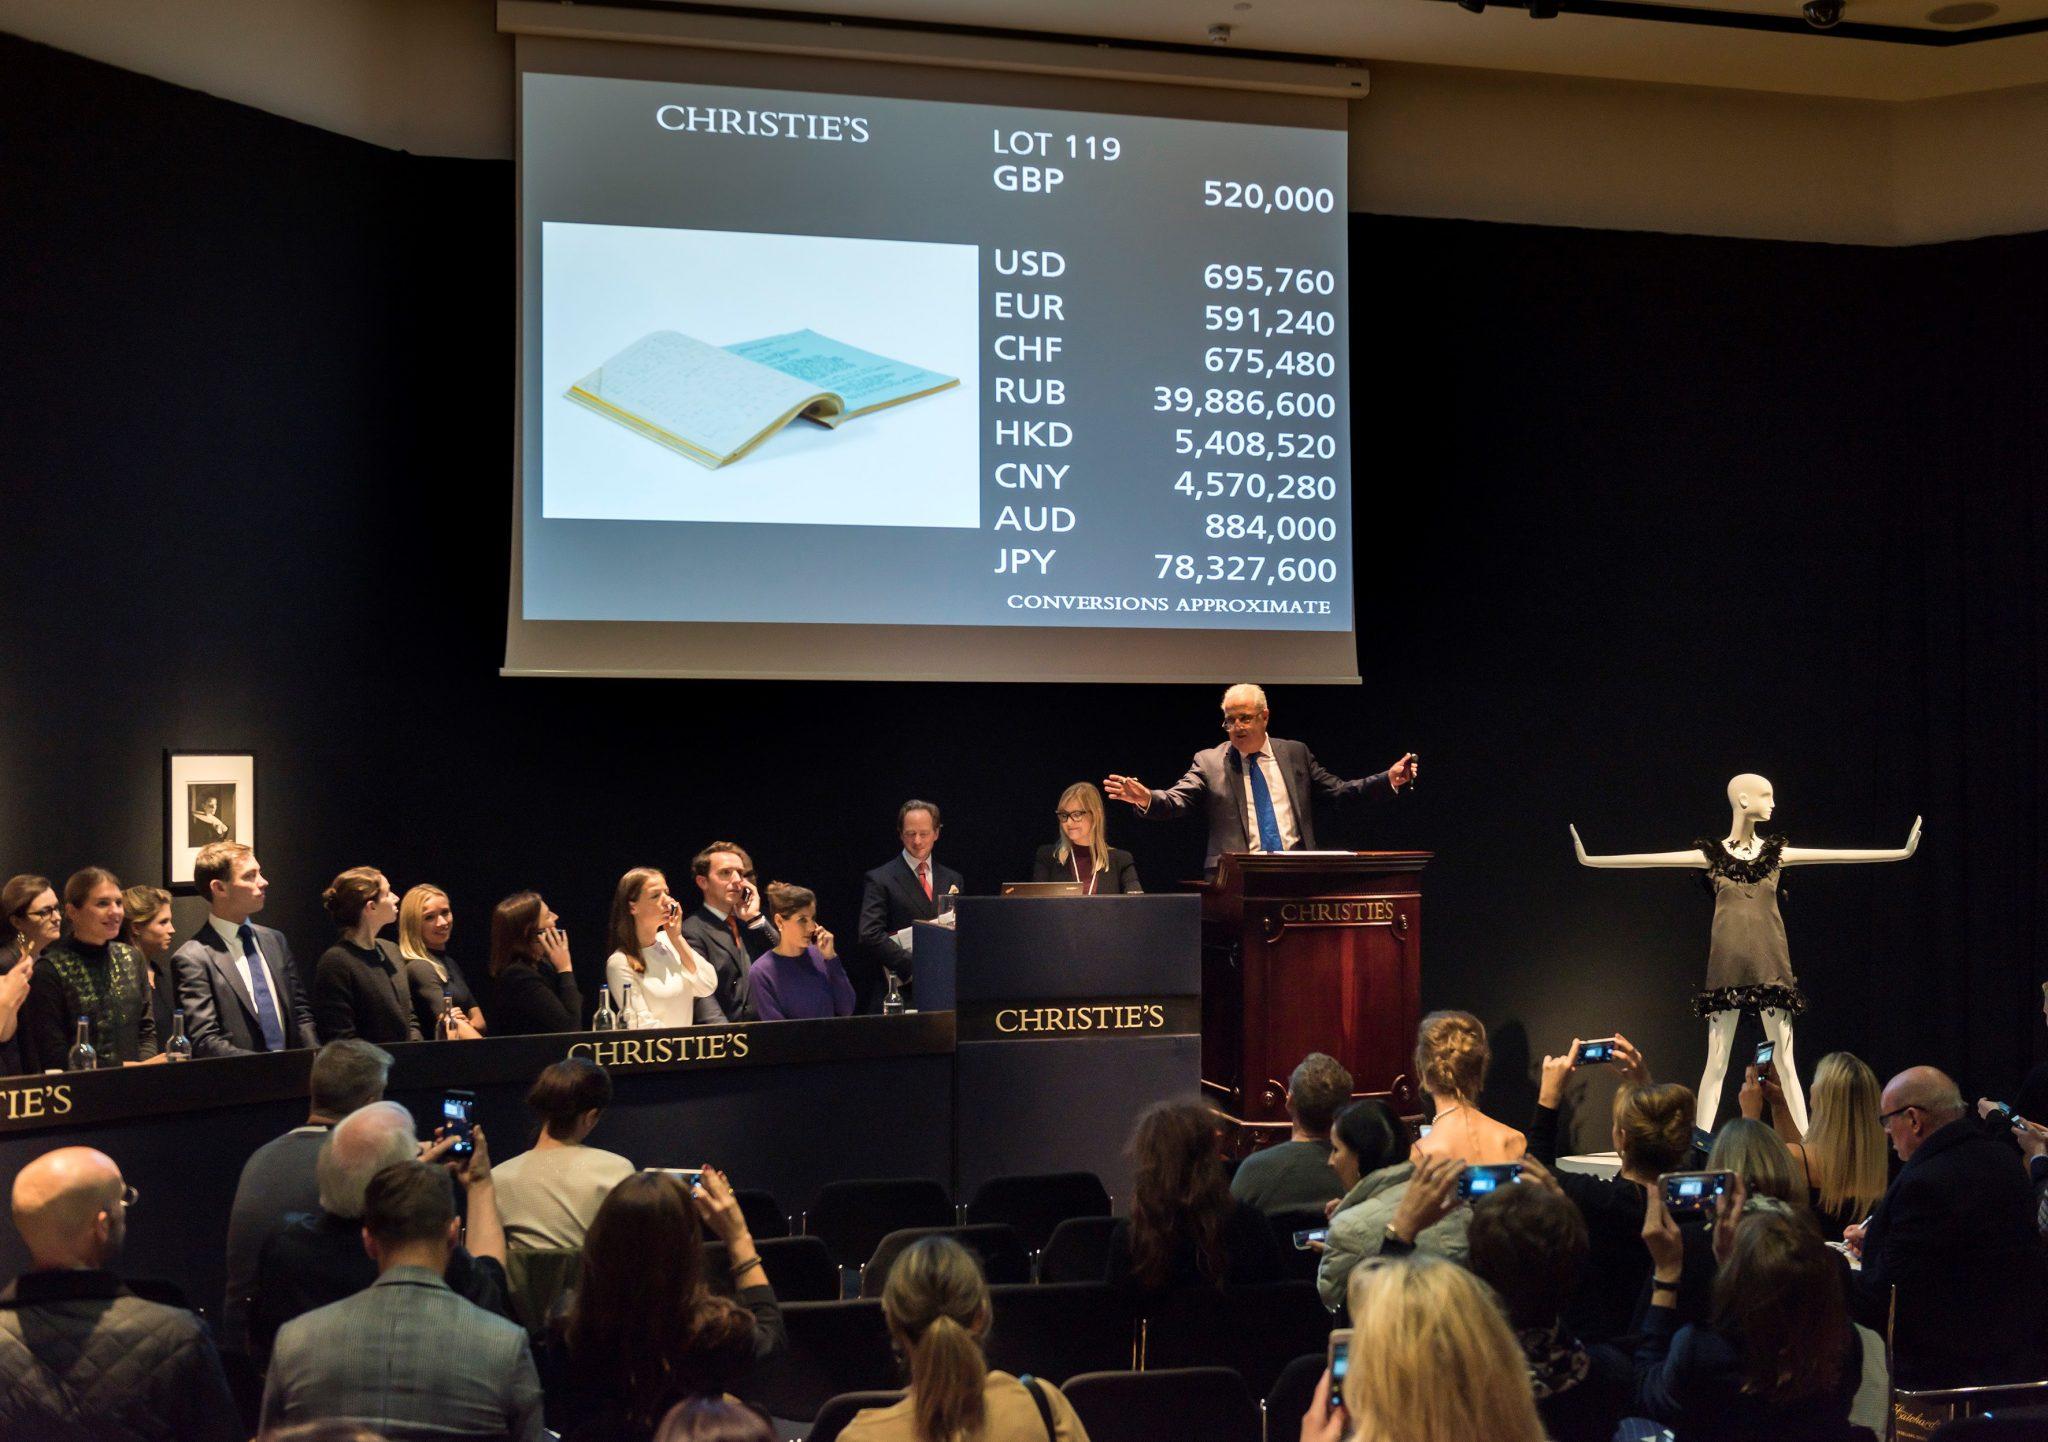 Copione di Colazione da Tiffany a £632,750: successo per l'asta di Audrey Hepburn da Christie's